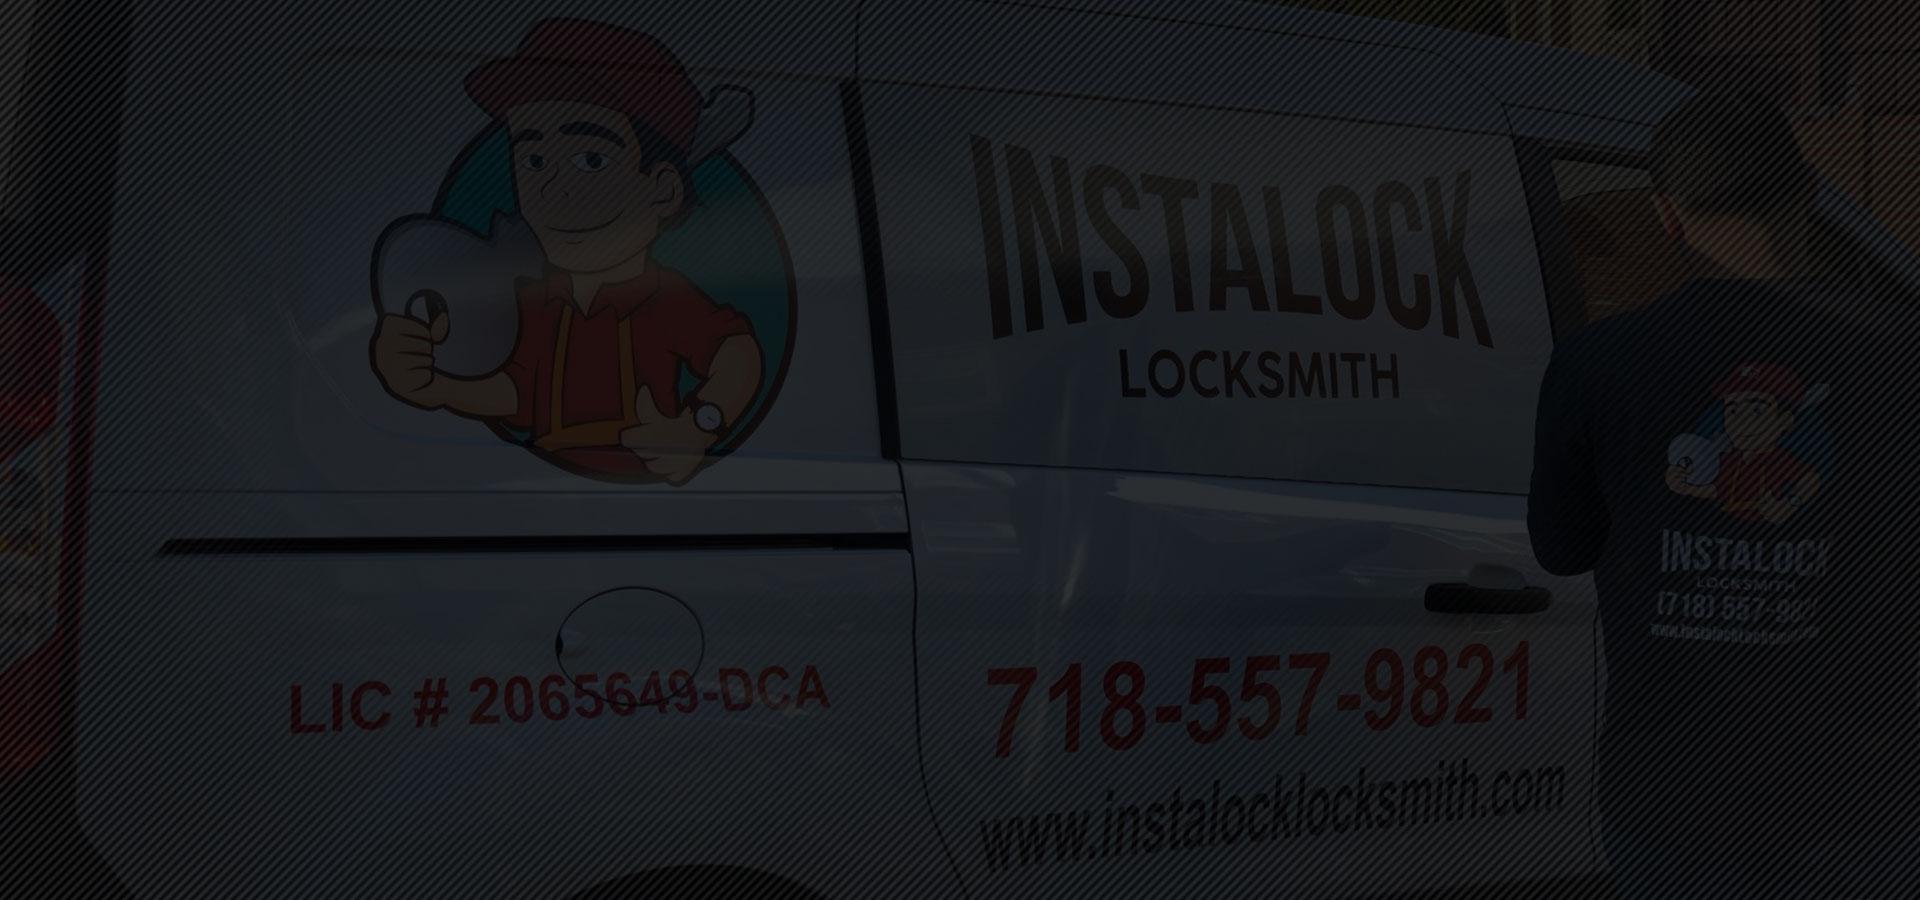 Insta locksmith